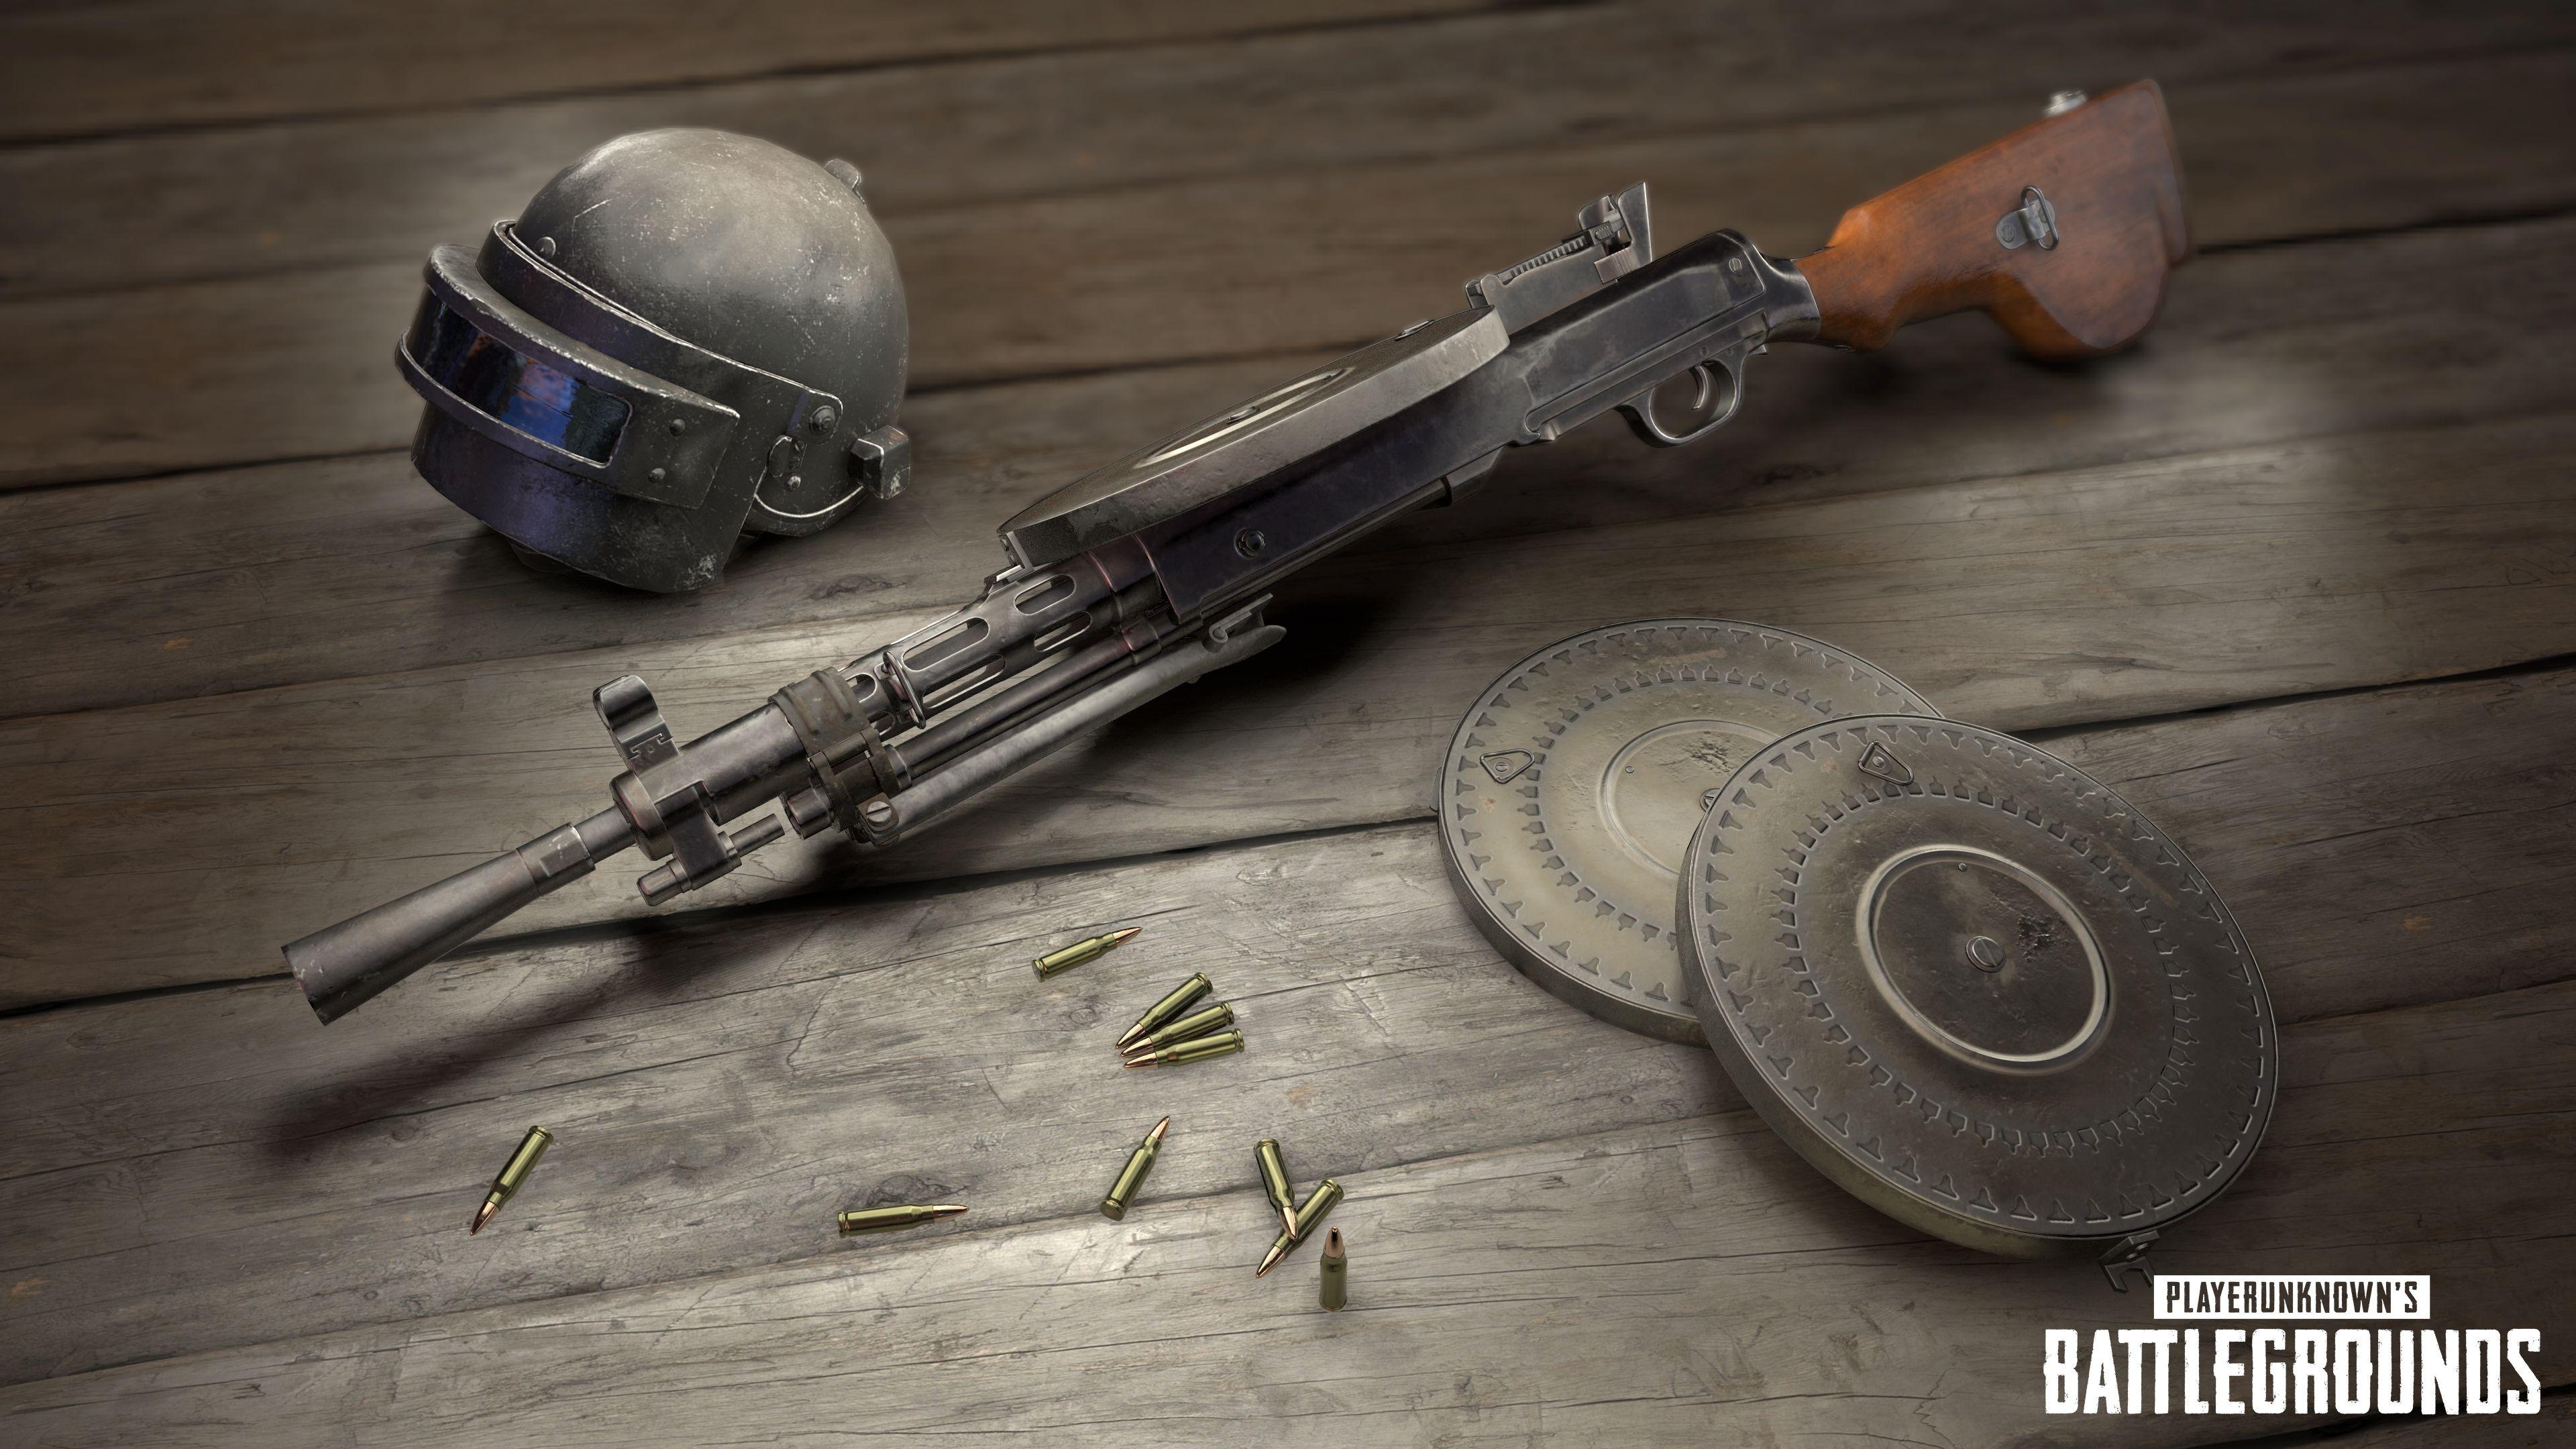 Superior PUBG PlayerUnknownu0027s Battlegrounds Weapons 4K Wallpaper PlayerUnknownu0027s  Battlegrounds (PUBG) 4k Wallpapers